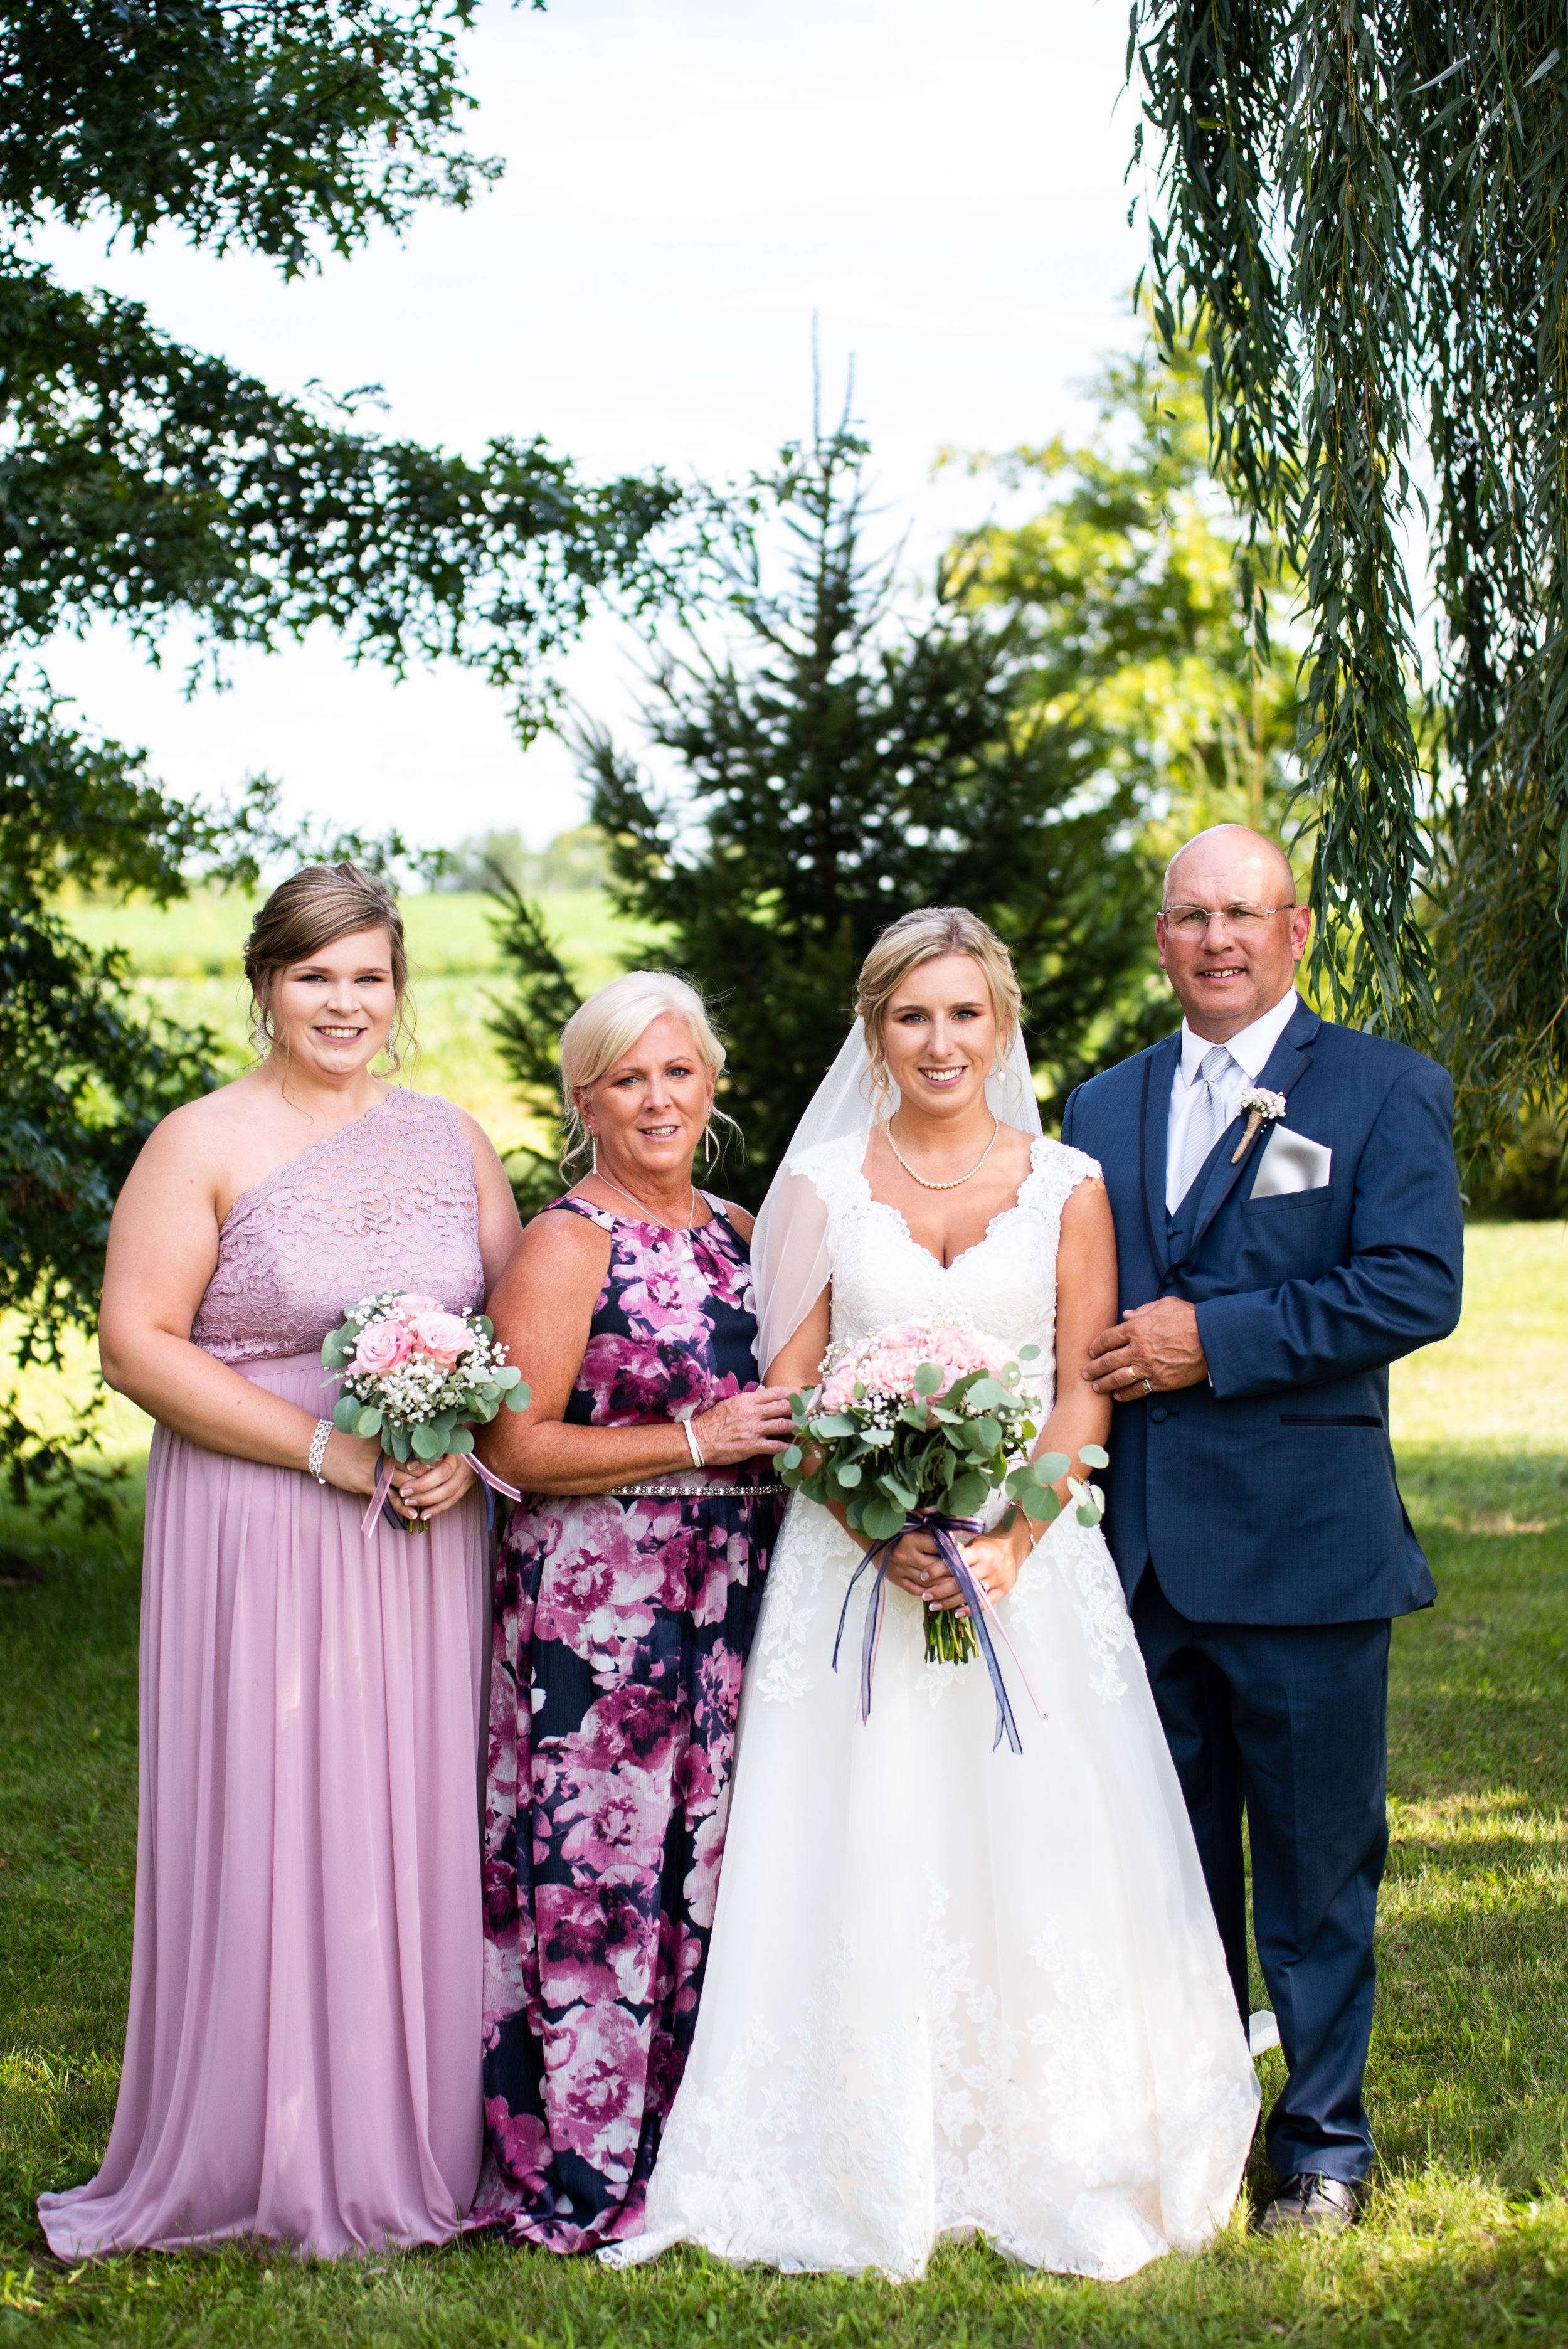 wedding (1 of 1)-105.jpg